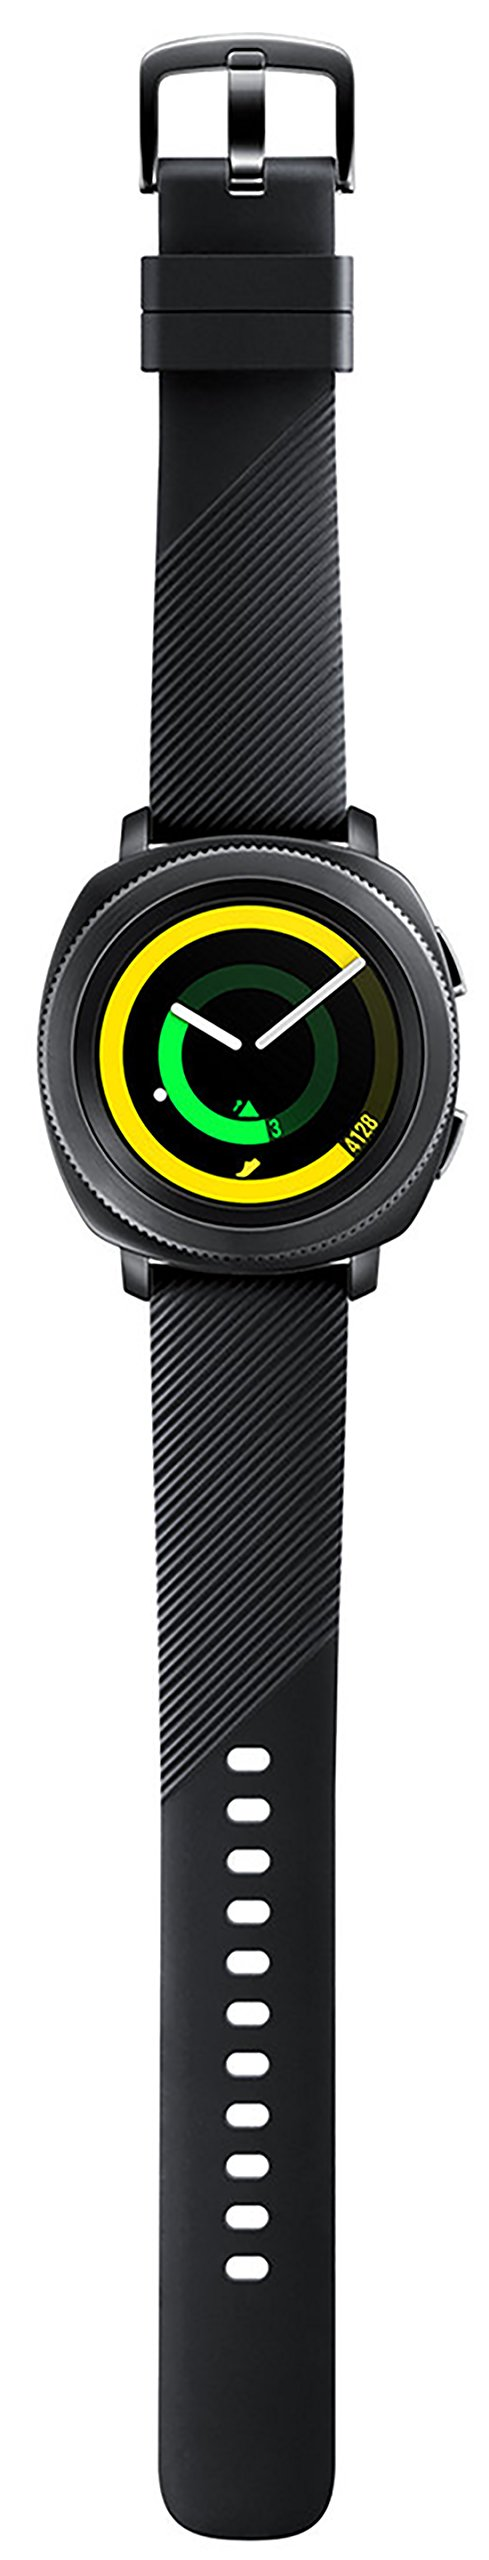 Samsung Gear Sport Smartwatch Fitness Tracker- Water Resistant - International Version- No Warranty- Black (SM-R600NZKATTT) by Samsung (Image #5)